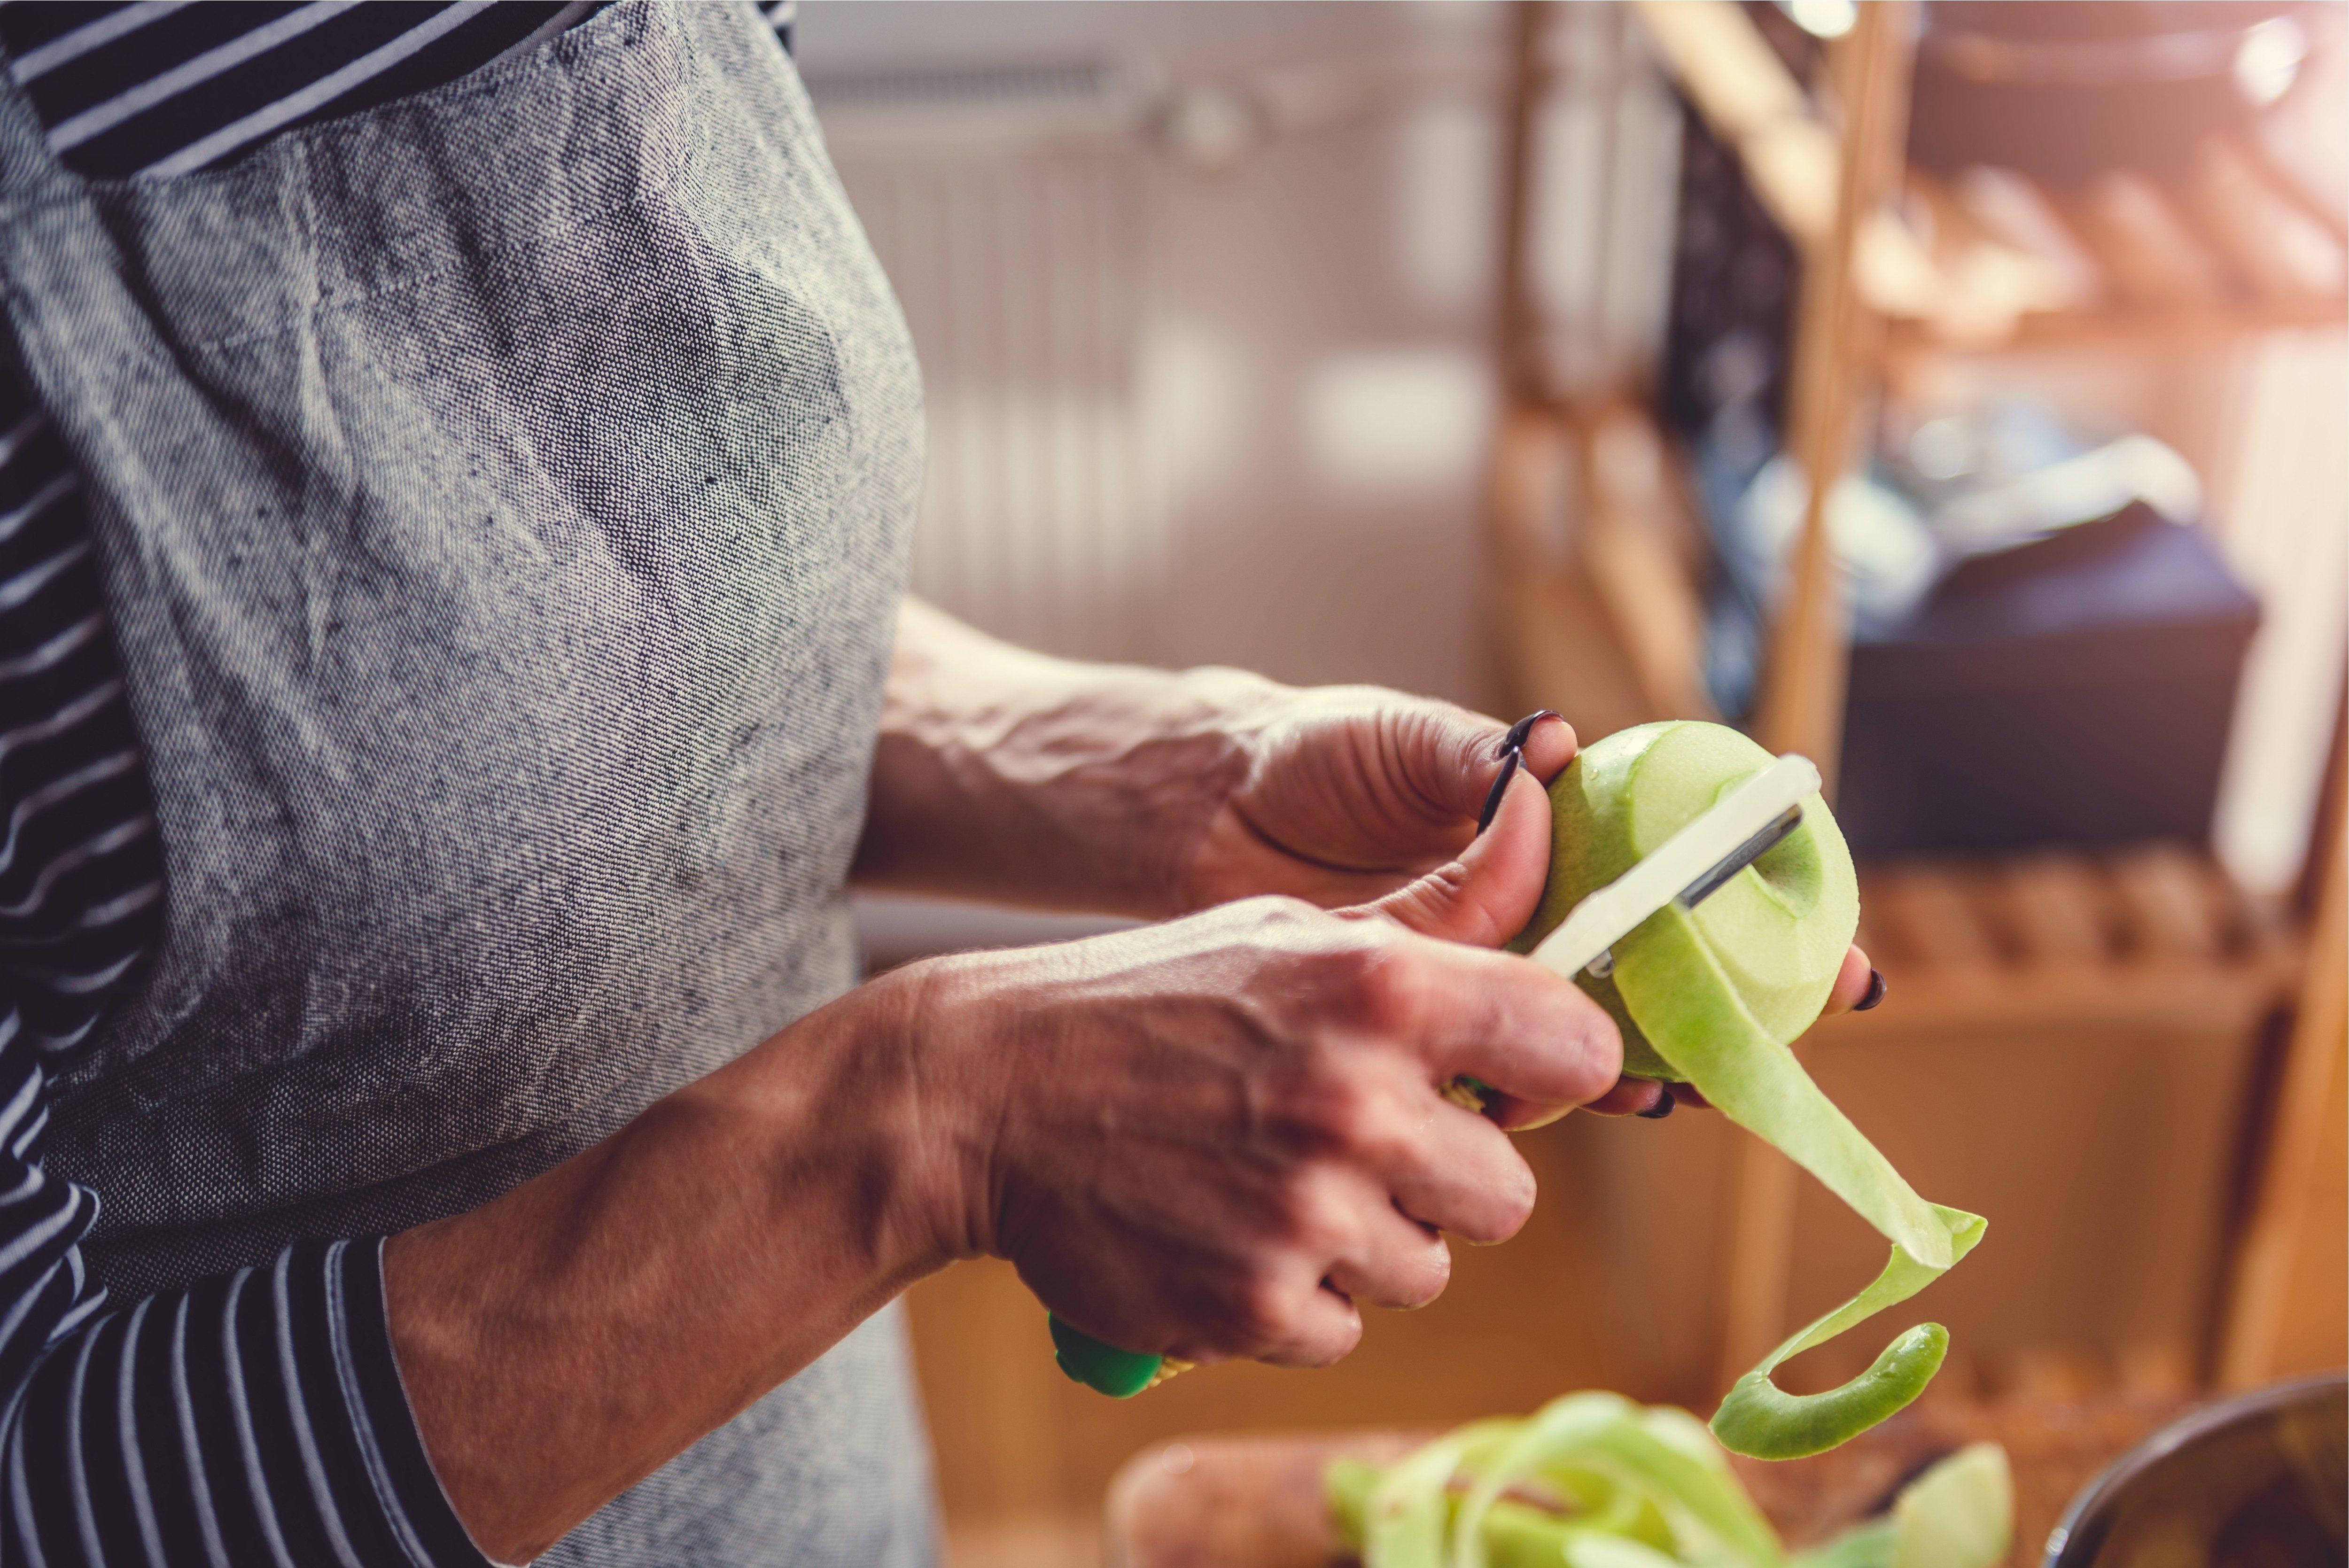 bad cooking habits peeling fruit